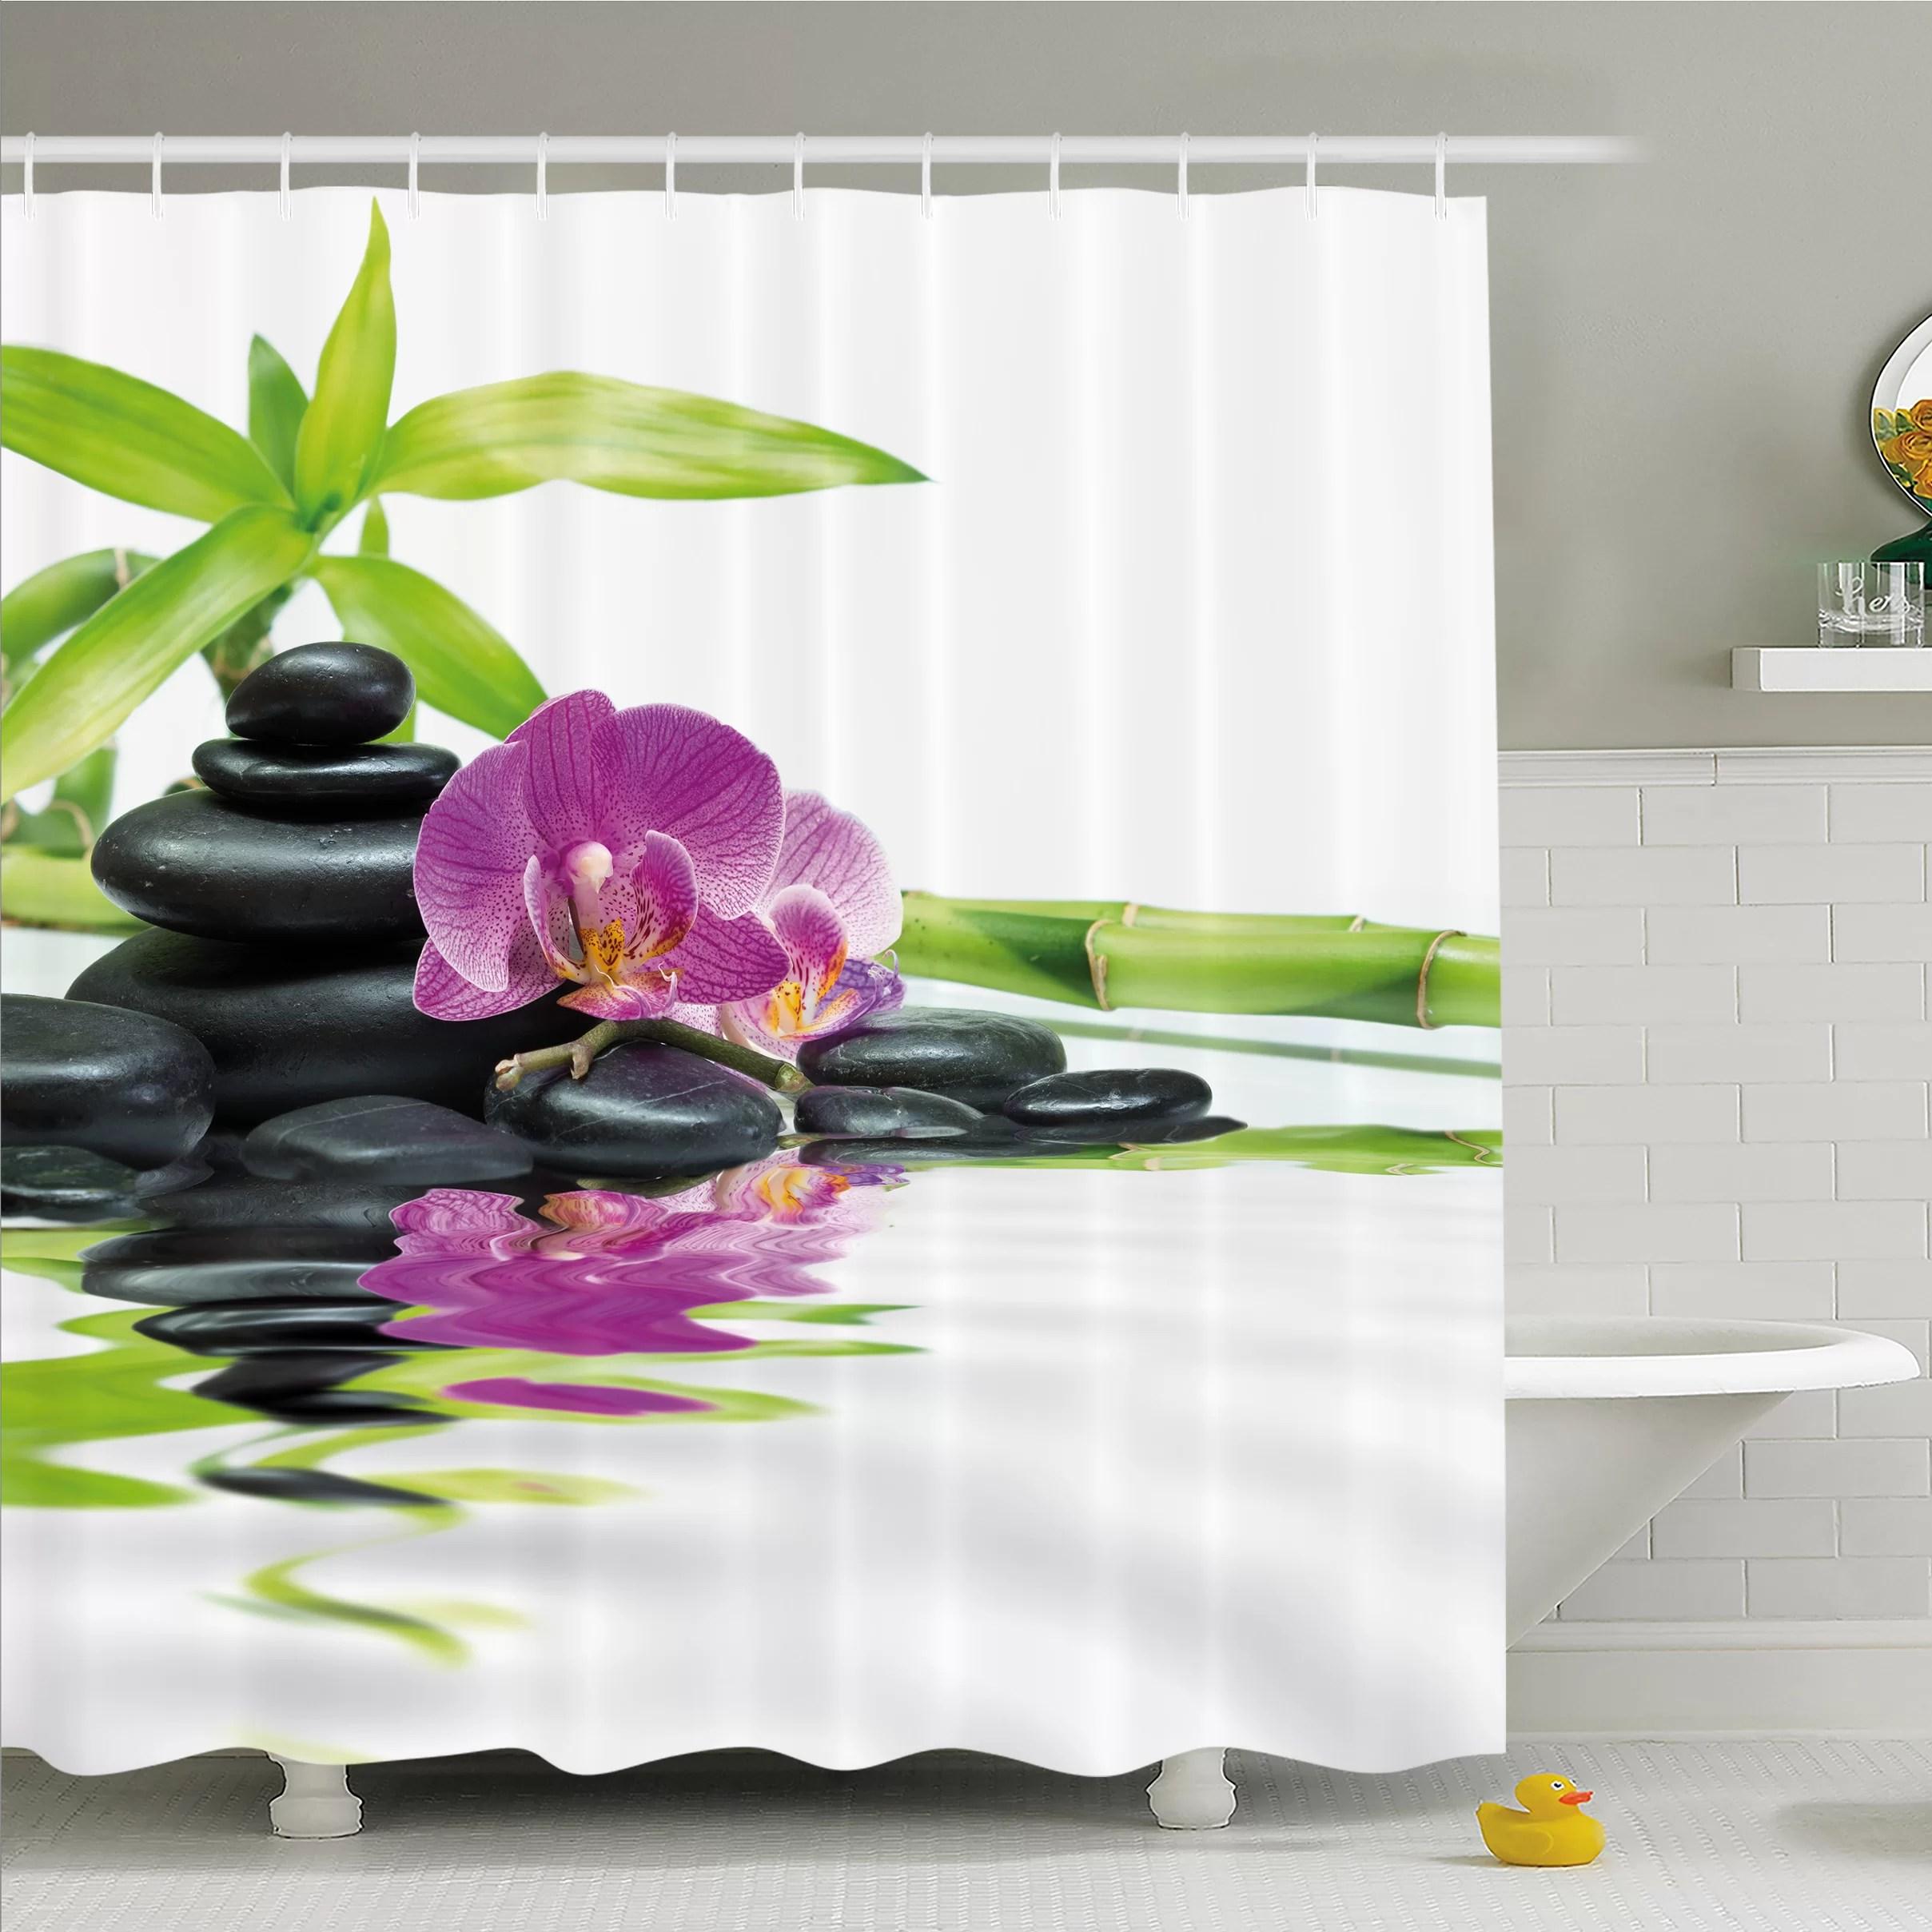 Home Garden Garden Curtains Spa Bathroom Waterproof Fabric